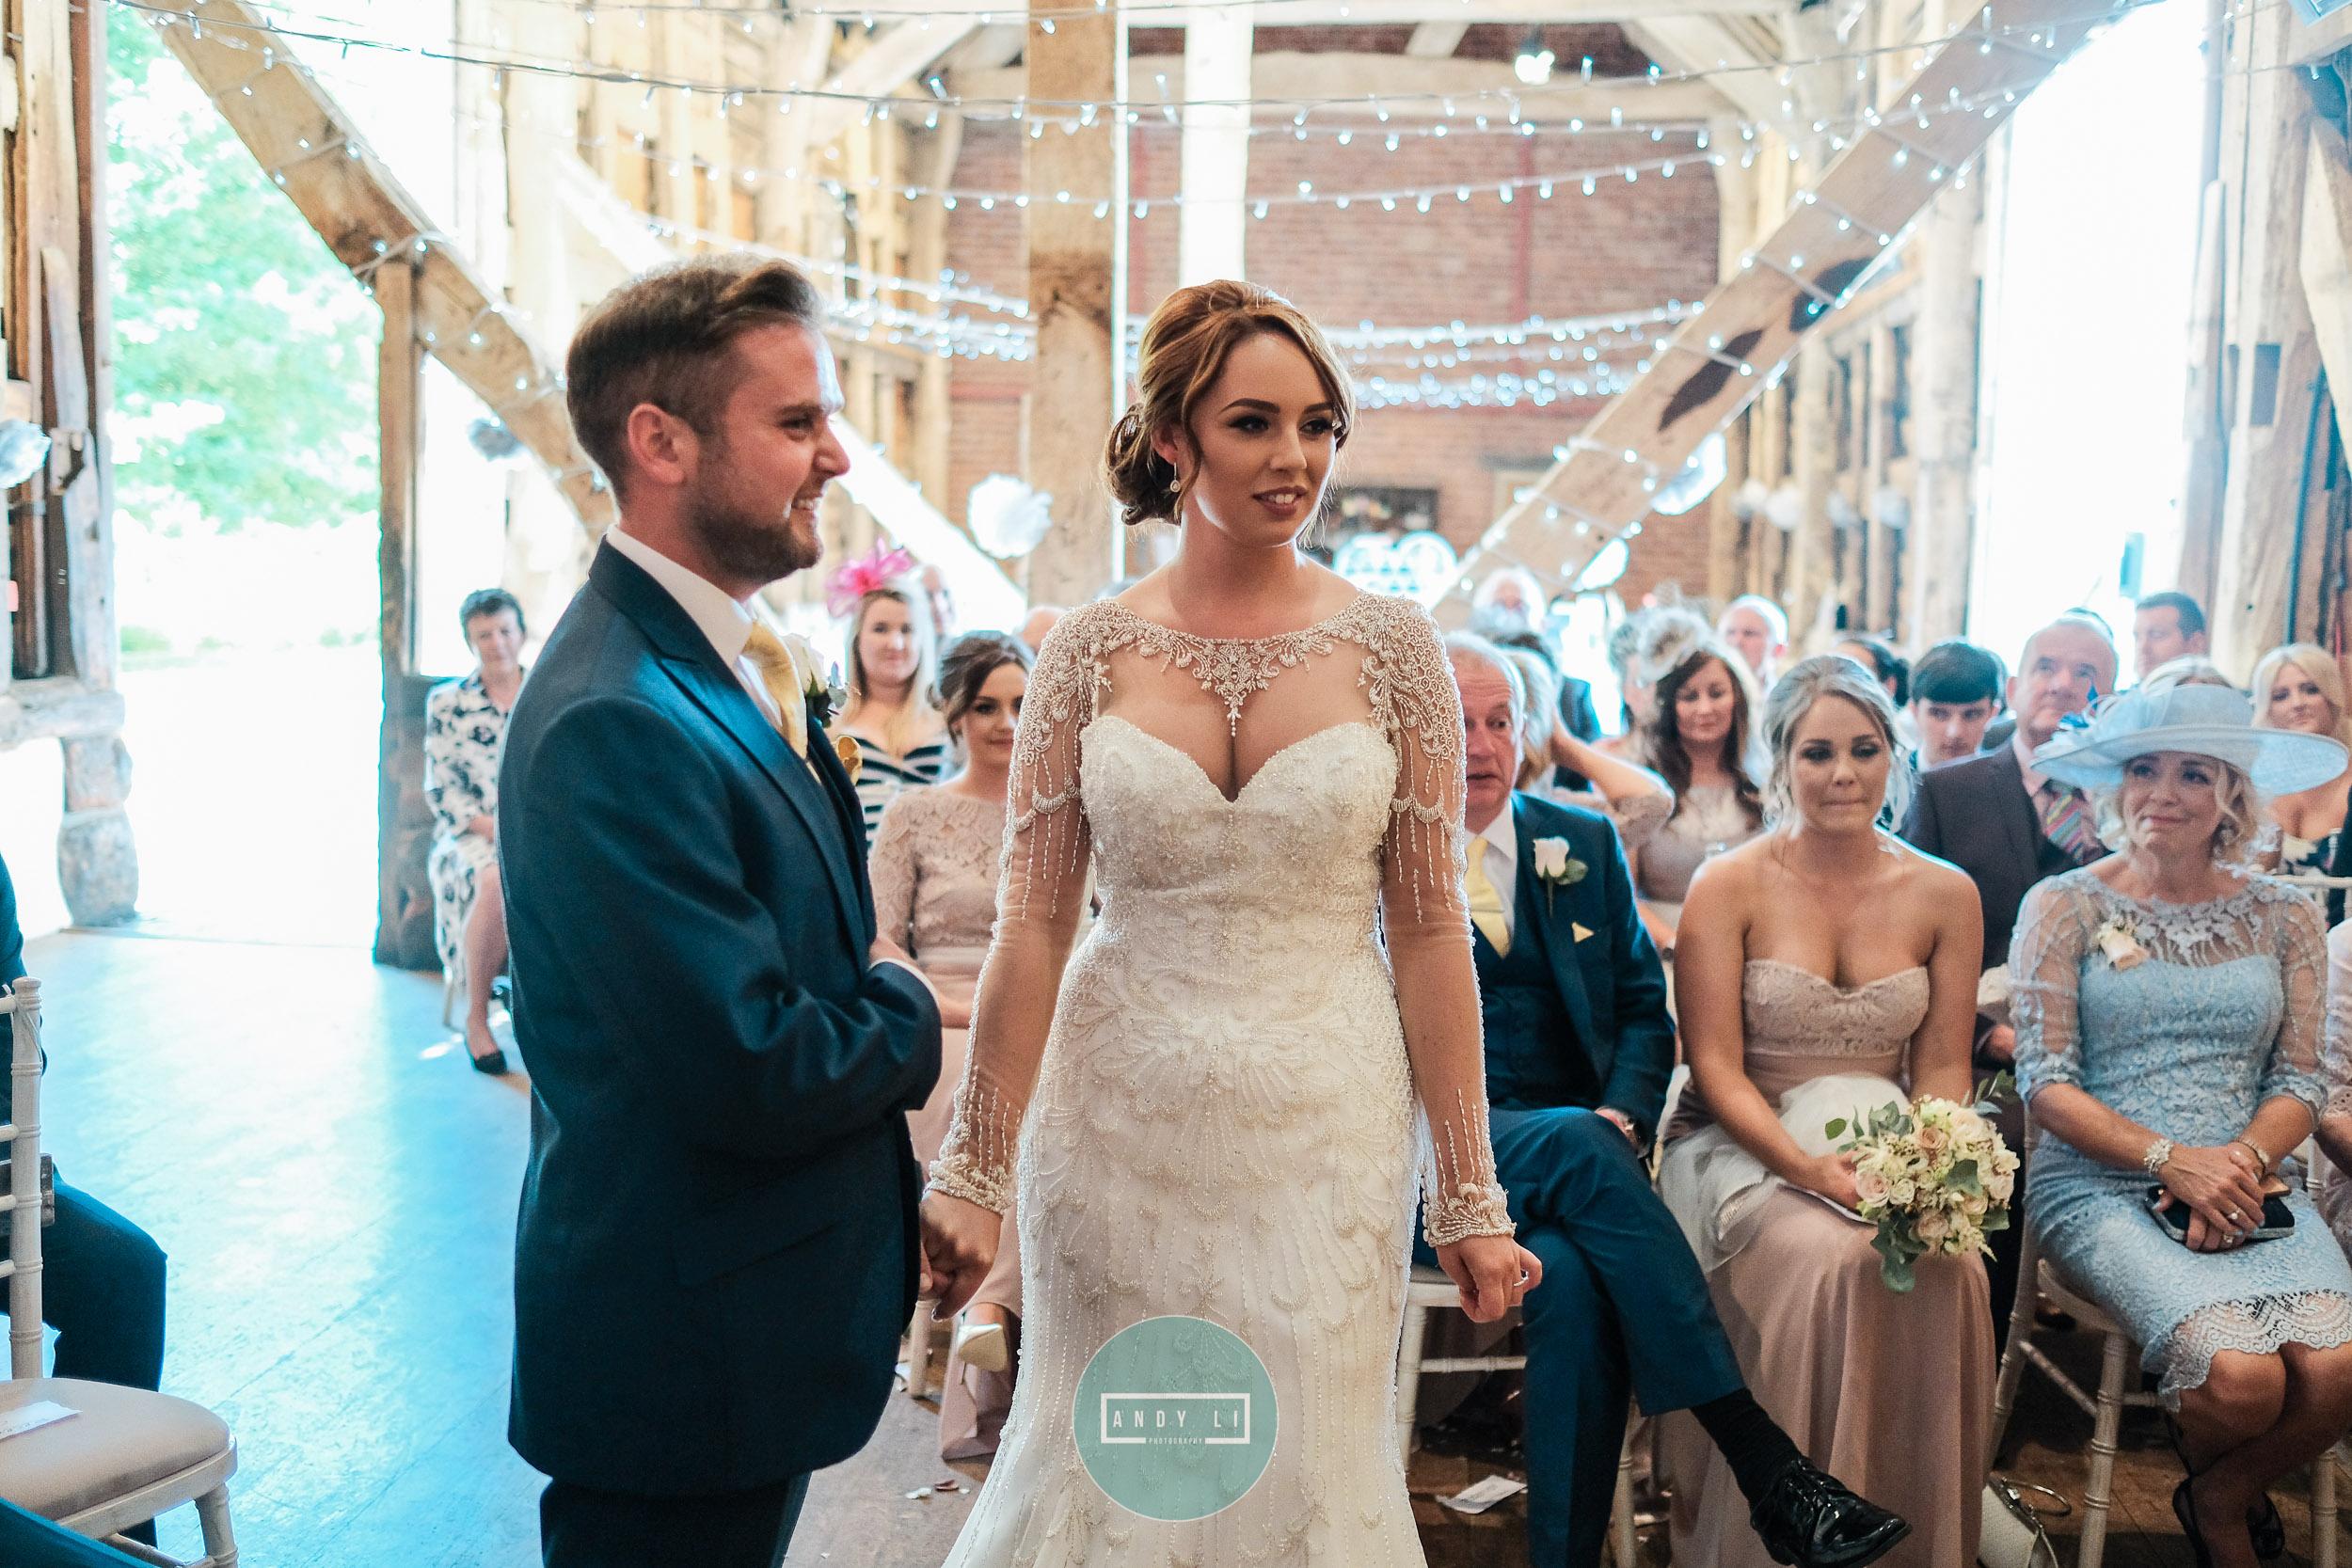 Pimhill Barn Wedding Photographer-064-DSCF0287.jpg